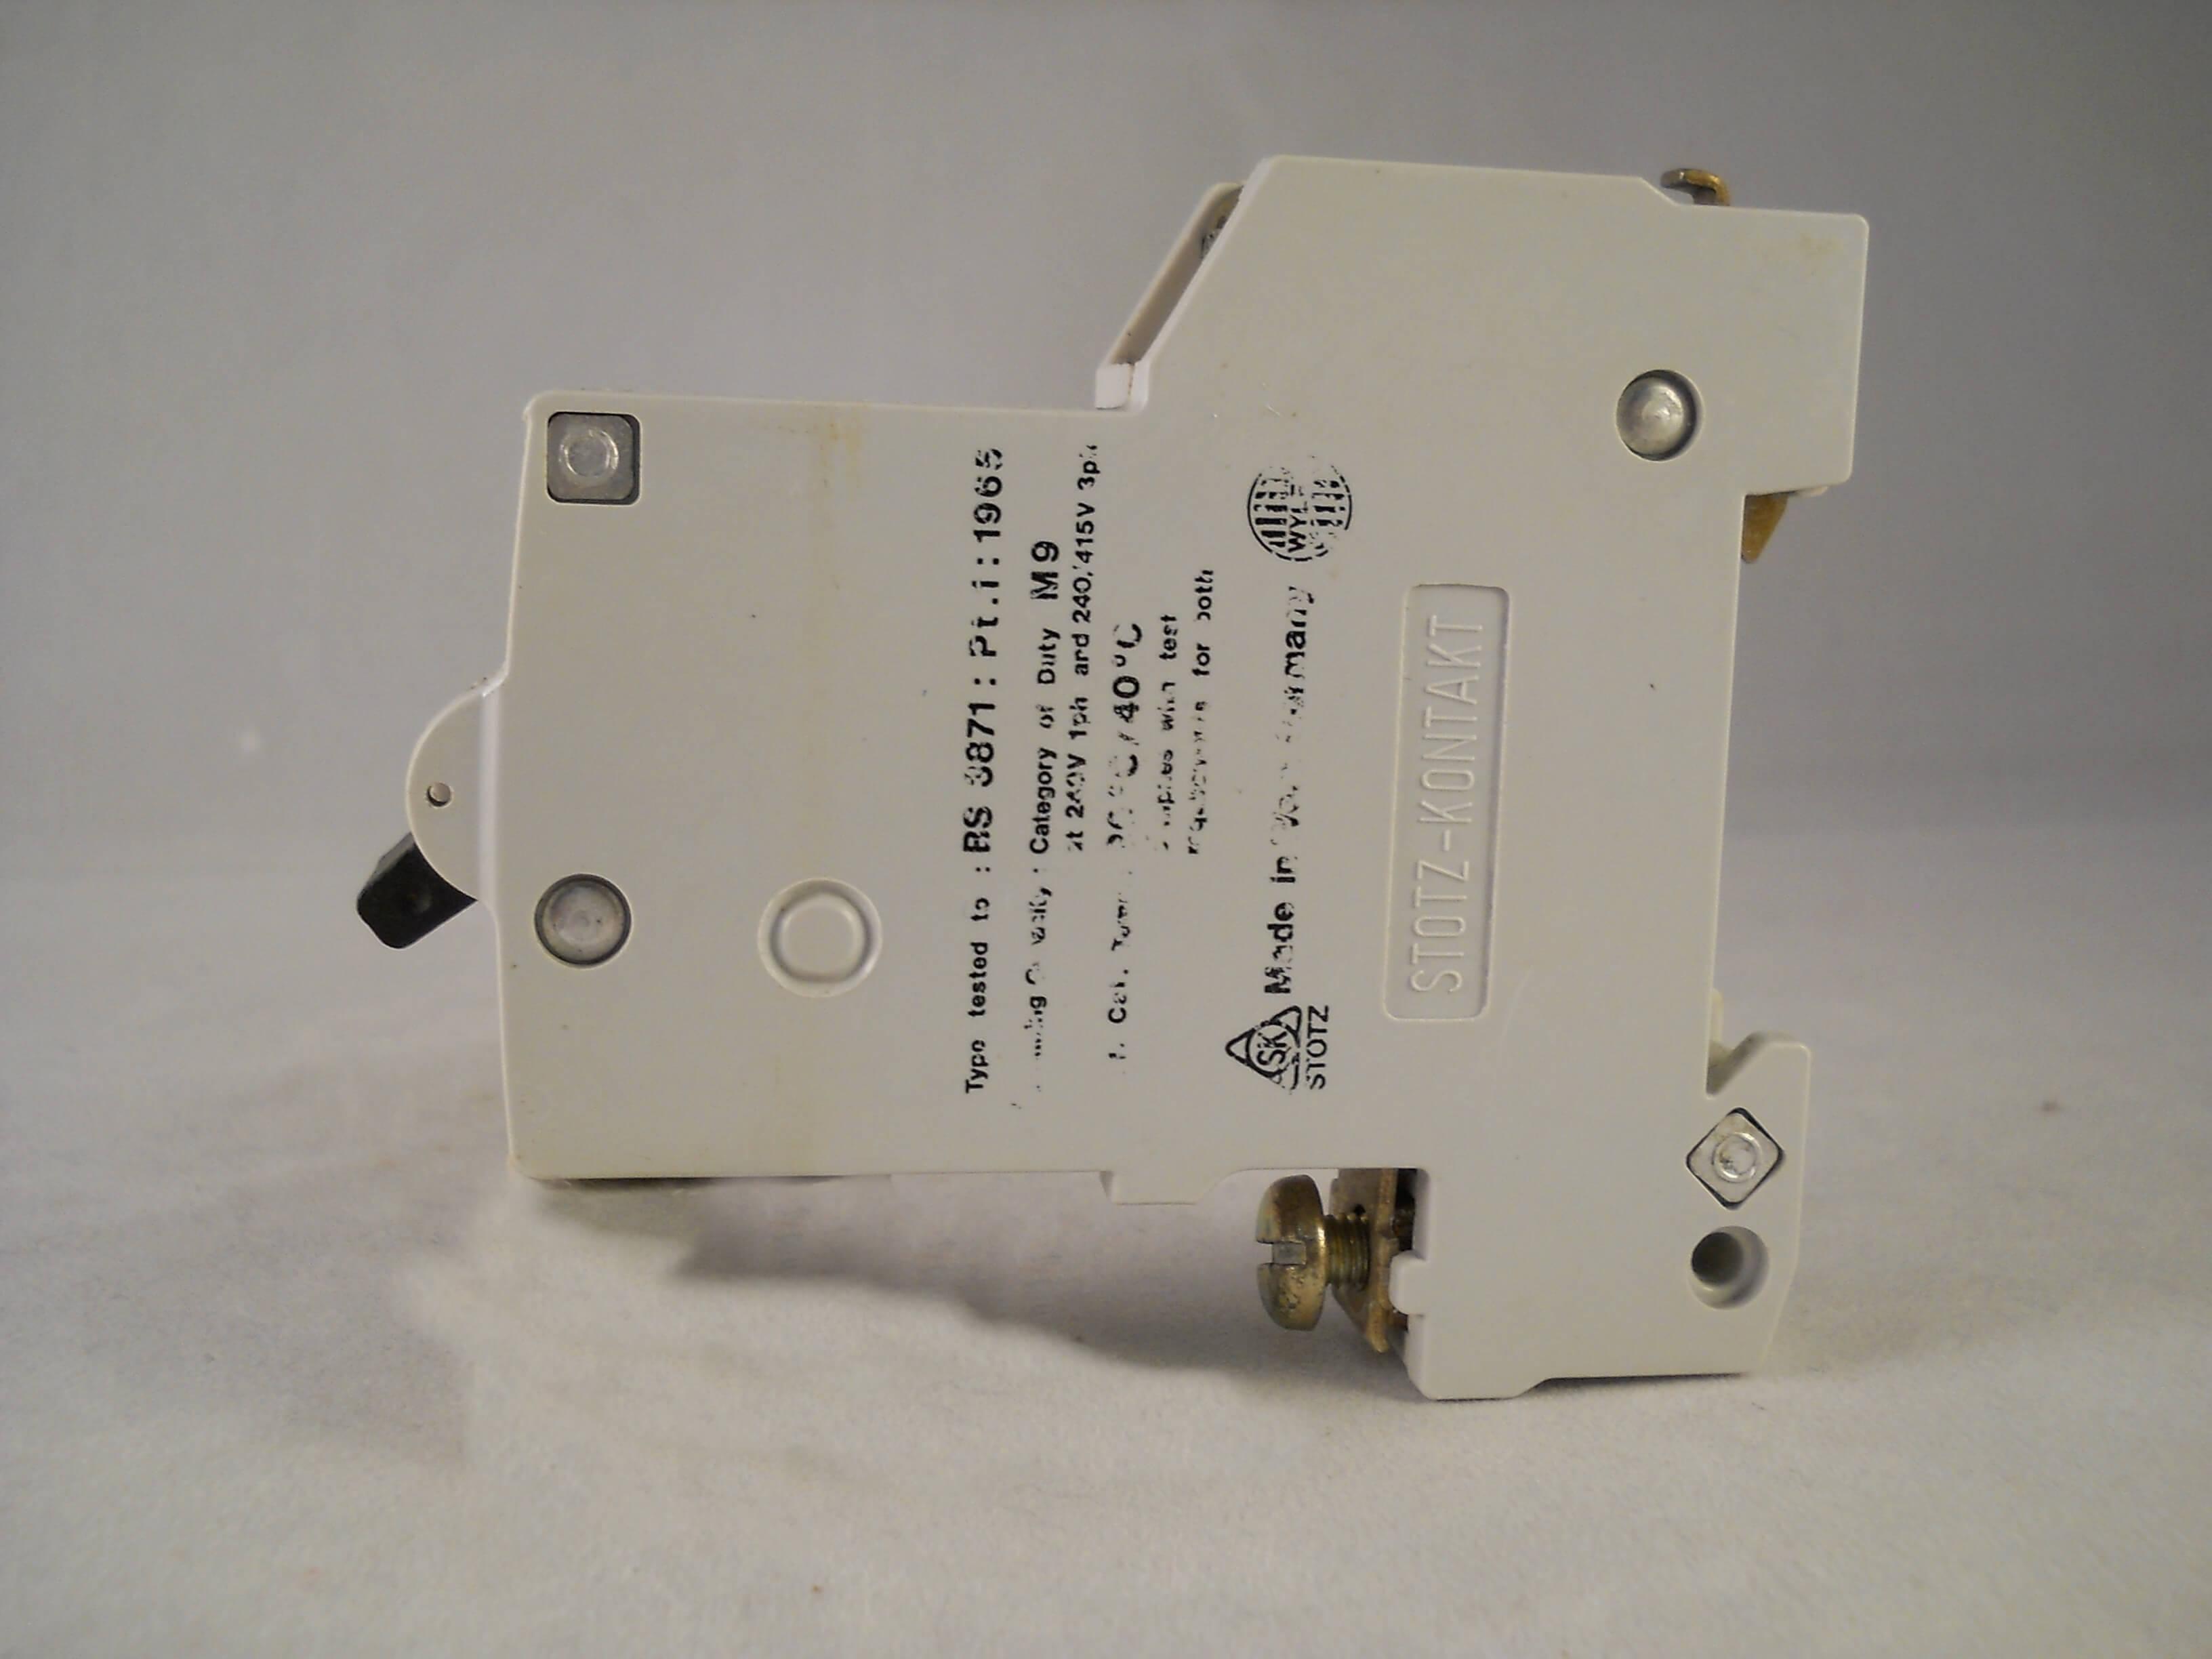 Wylex MCB 10 Amp M9 Type 2 Simple Pôle 10 A CIRCUIT BREAKER HB Stotz Kontakt HB10